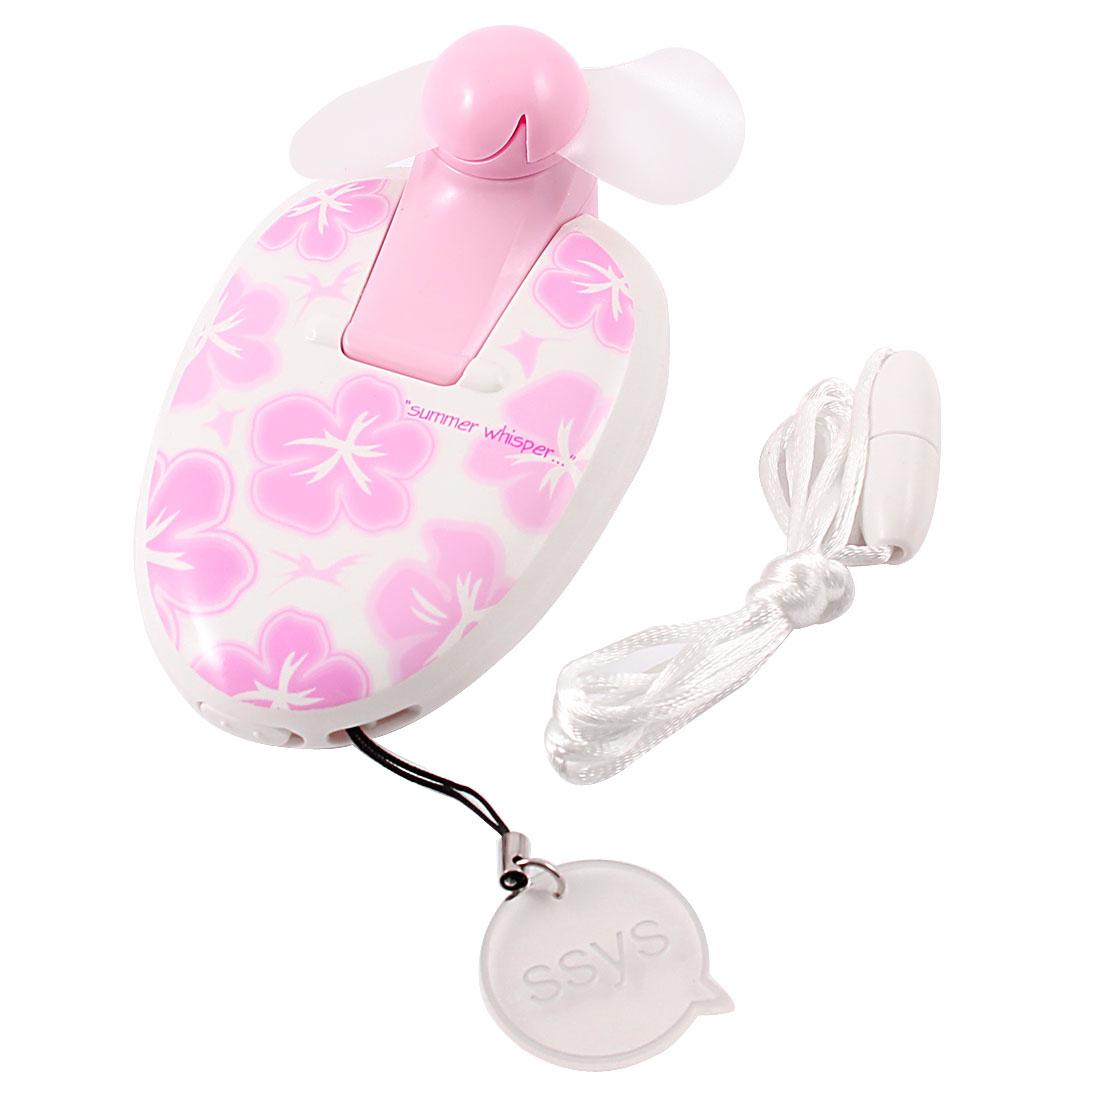 Office Ellipse Shaped Flower Ornament Mini Electric Cooling Fan Pink